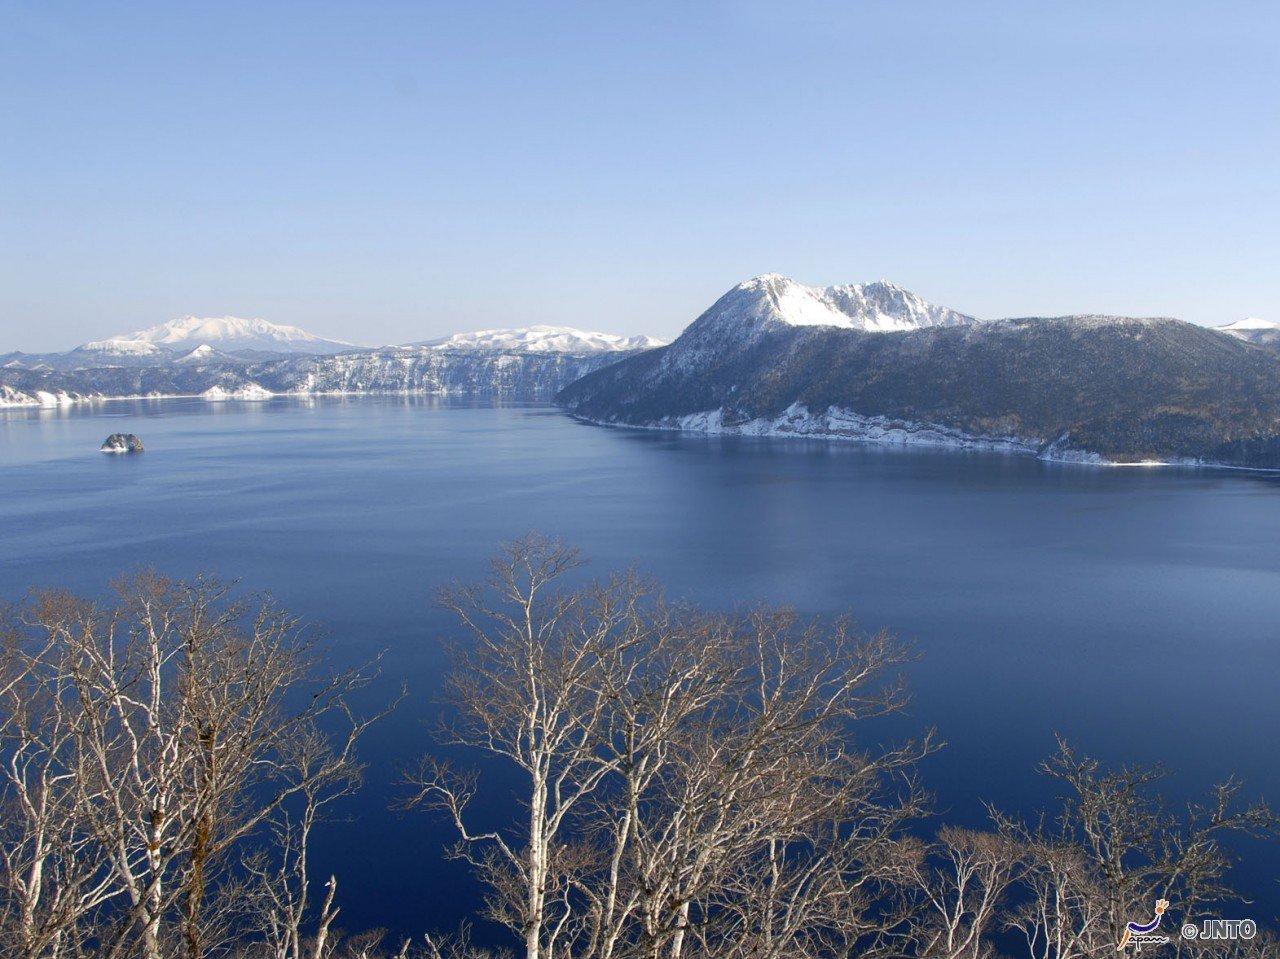 lago-mashu-inverno